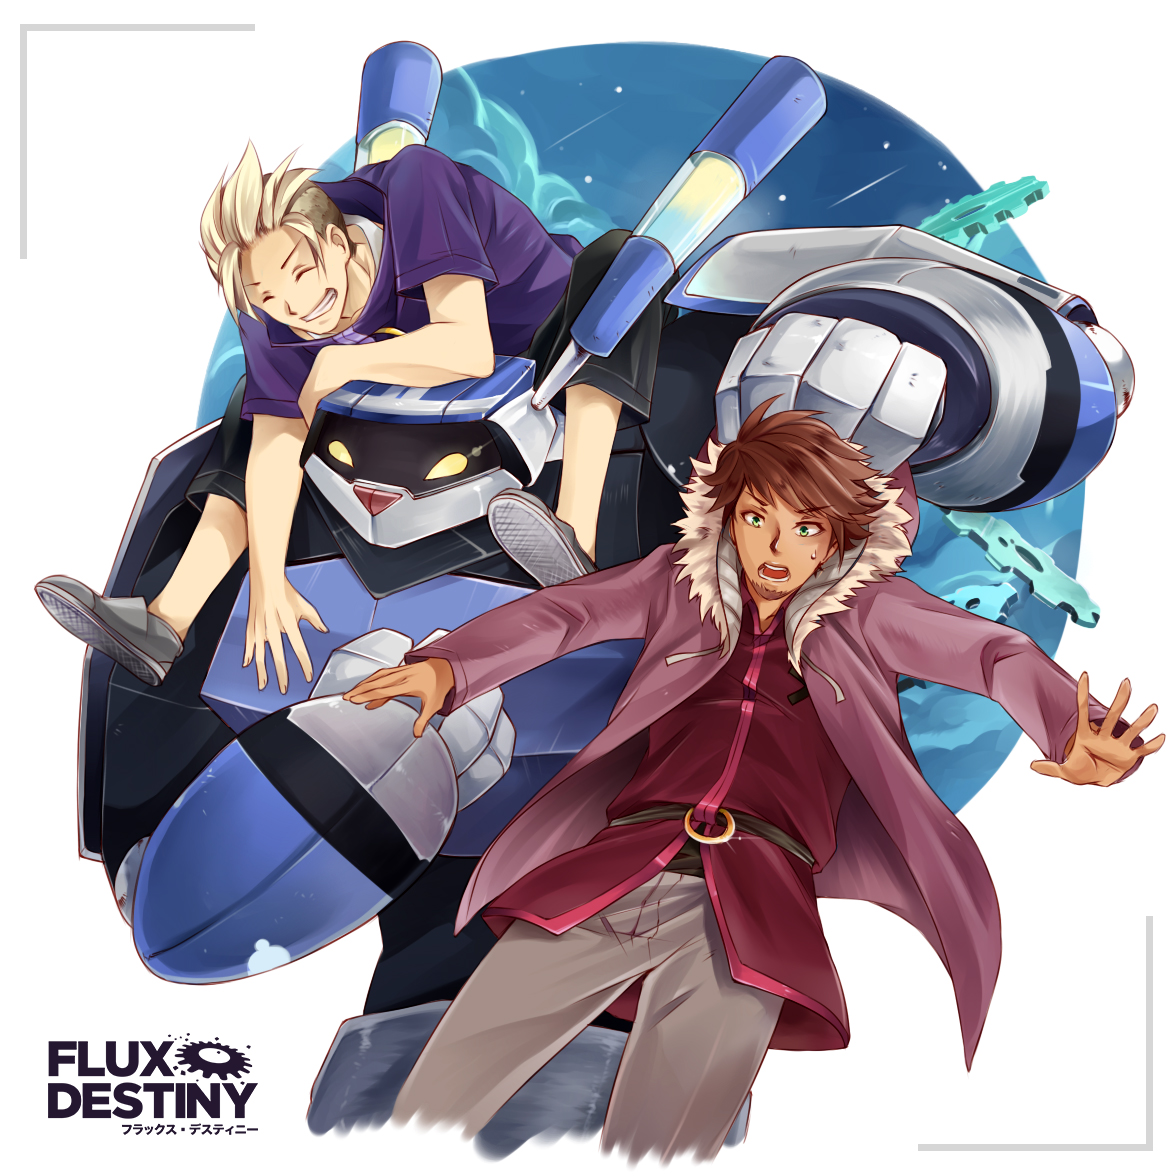 Flux Destiny Promo Art by Kei Seki.